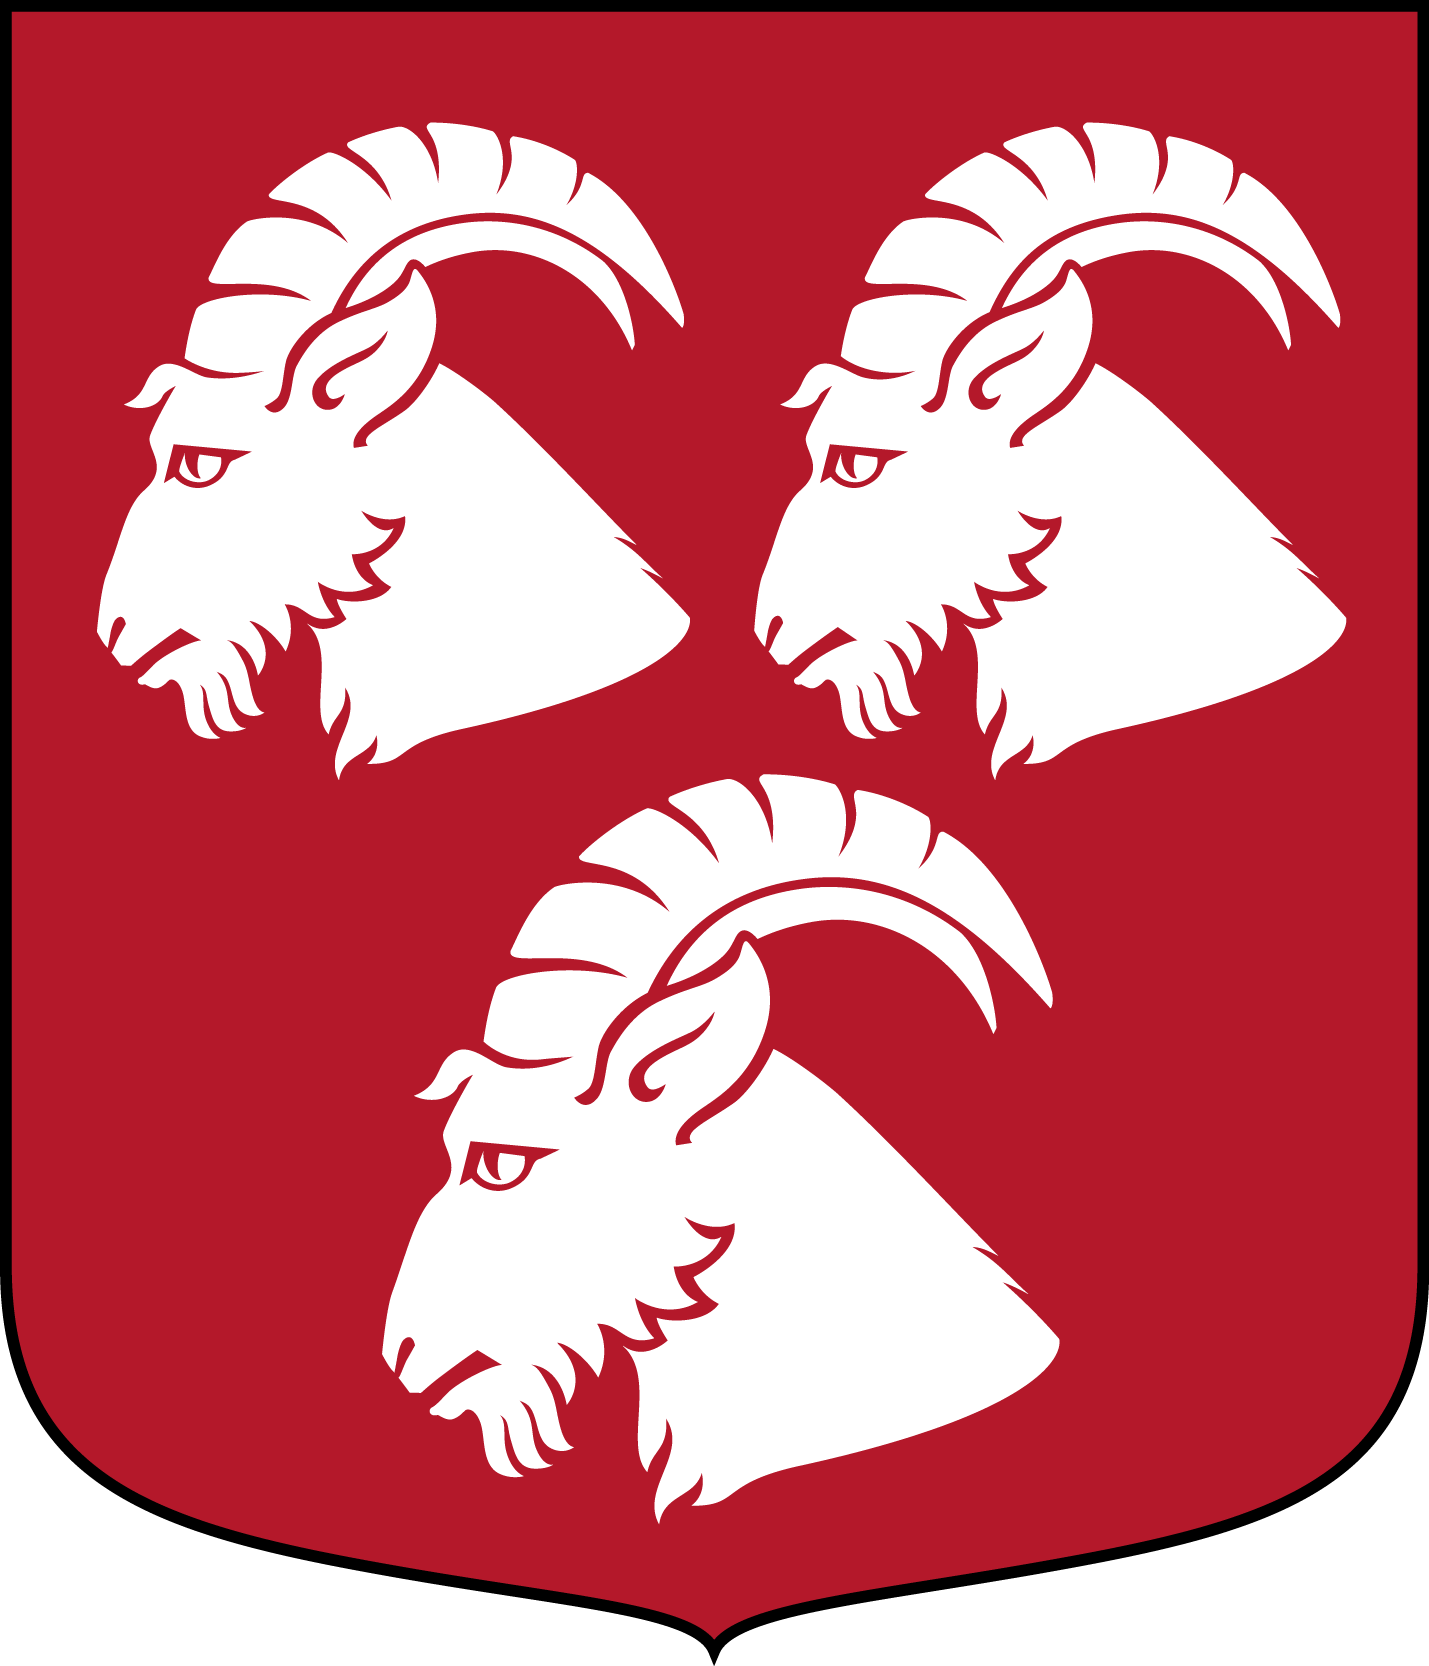 File:Hudiksvall kommunvapen.